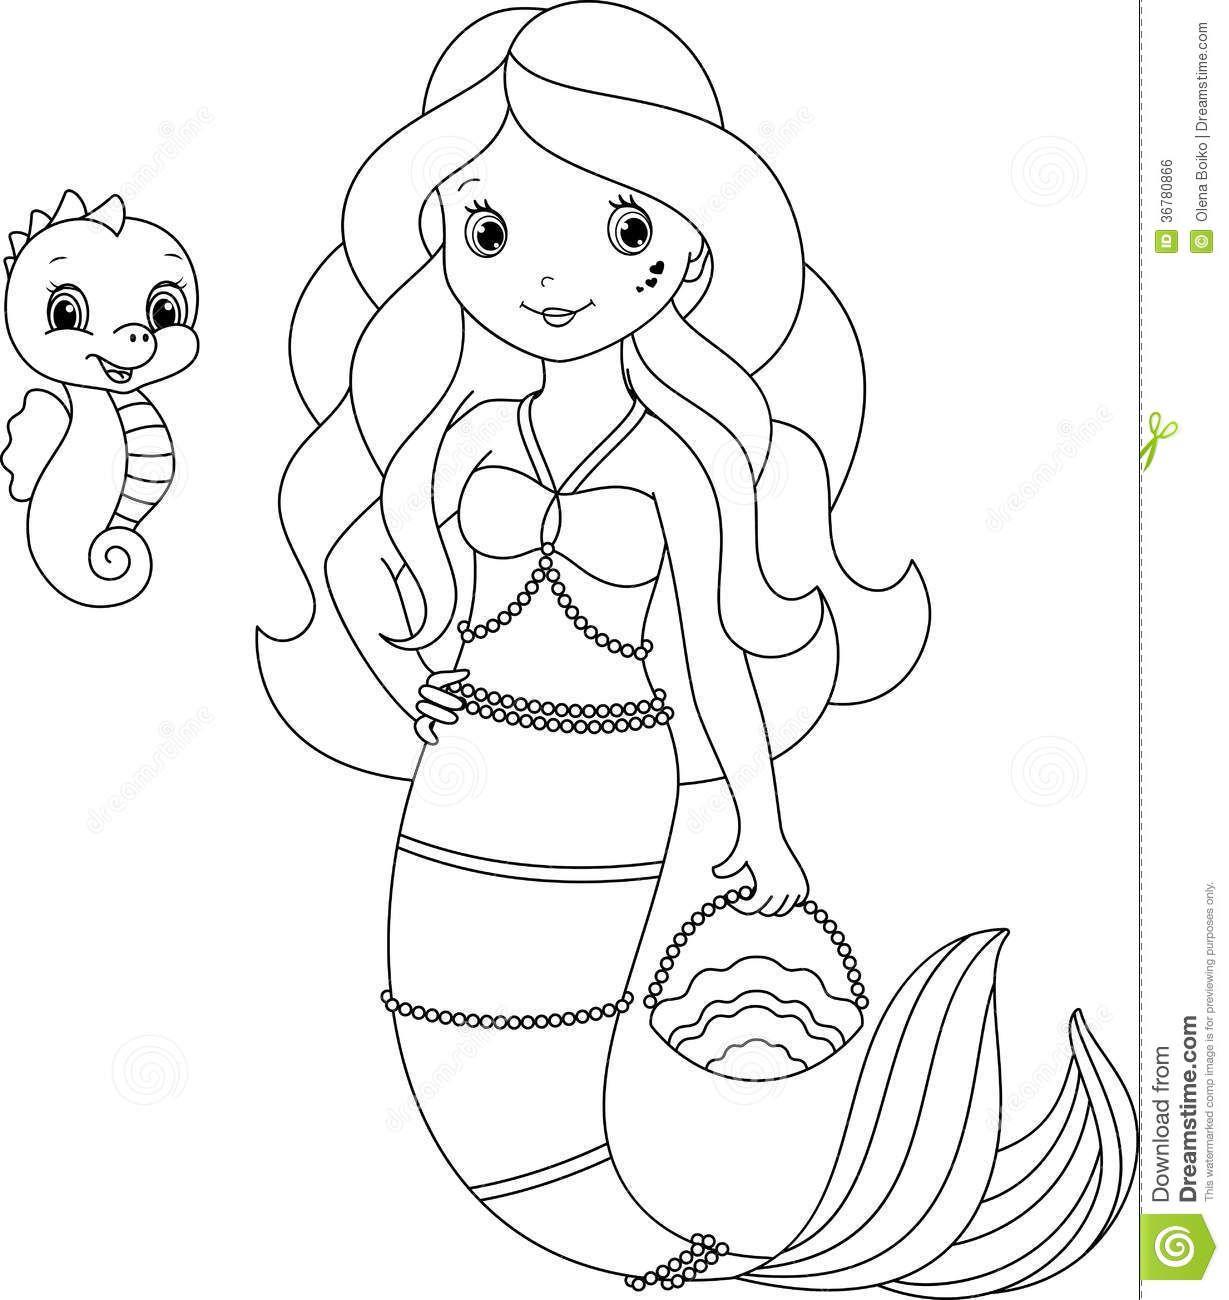 mermaid clip art black and white  google search  mermaid